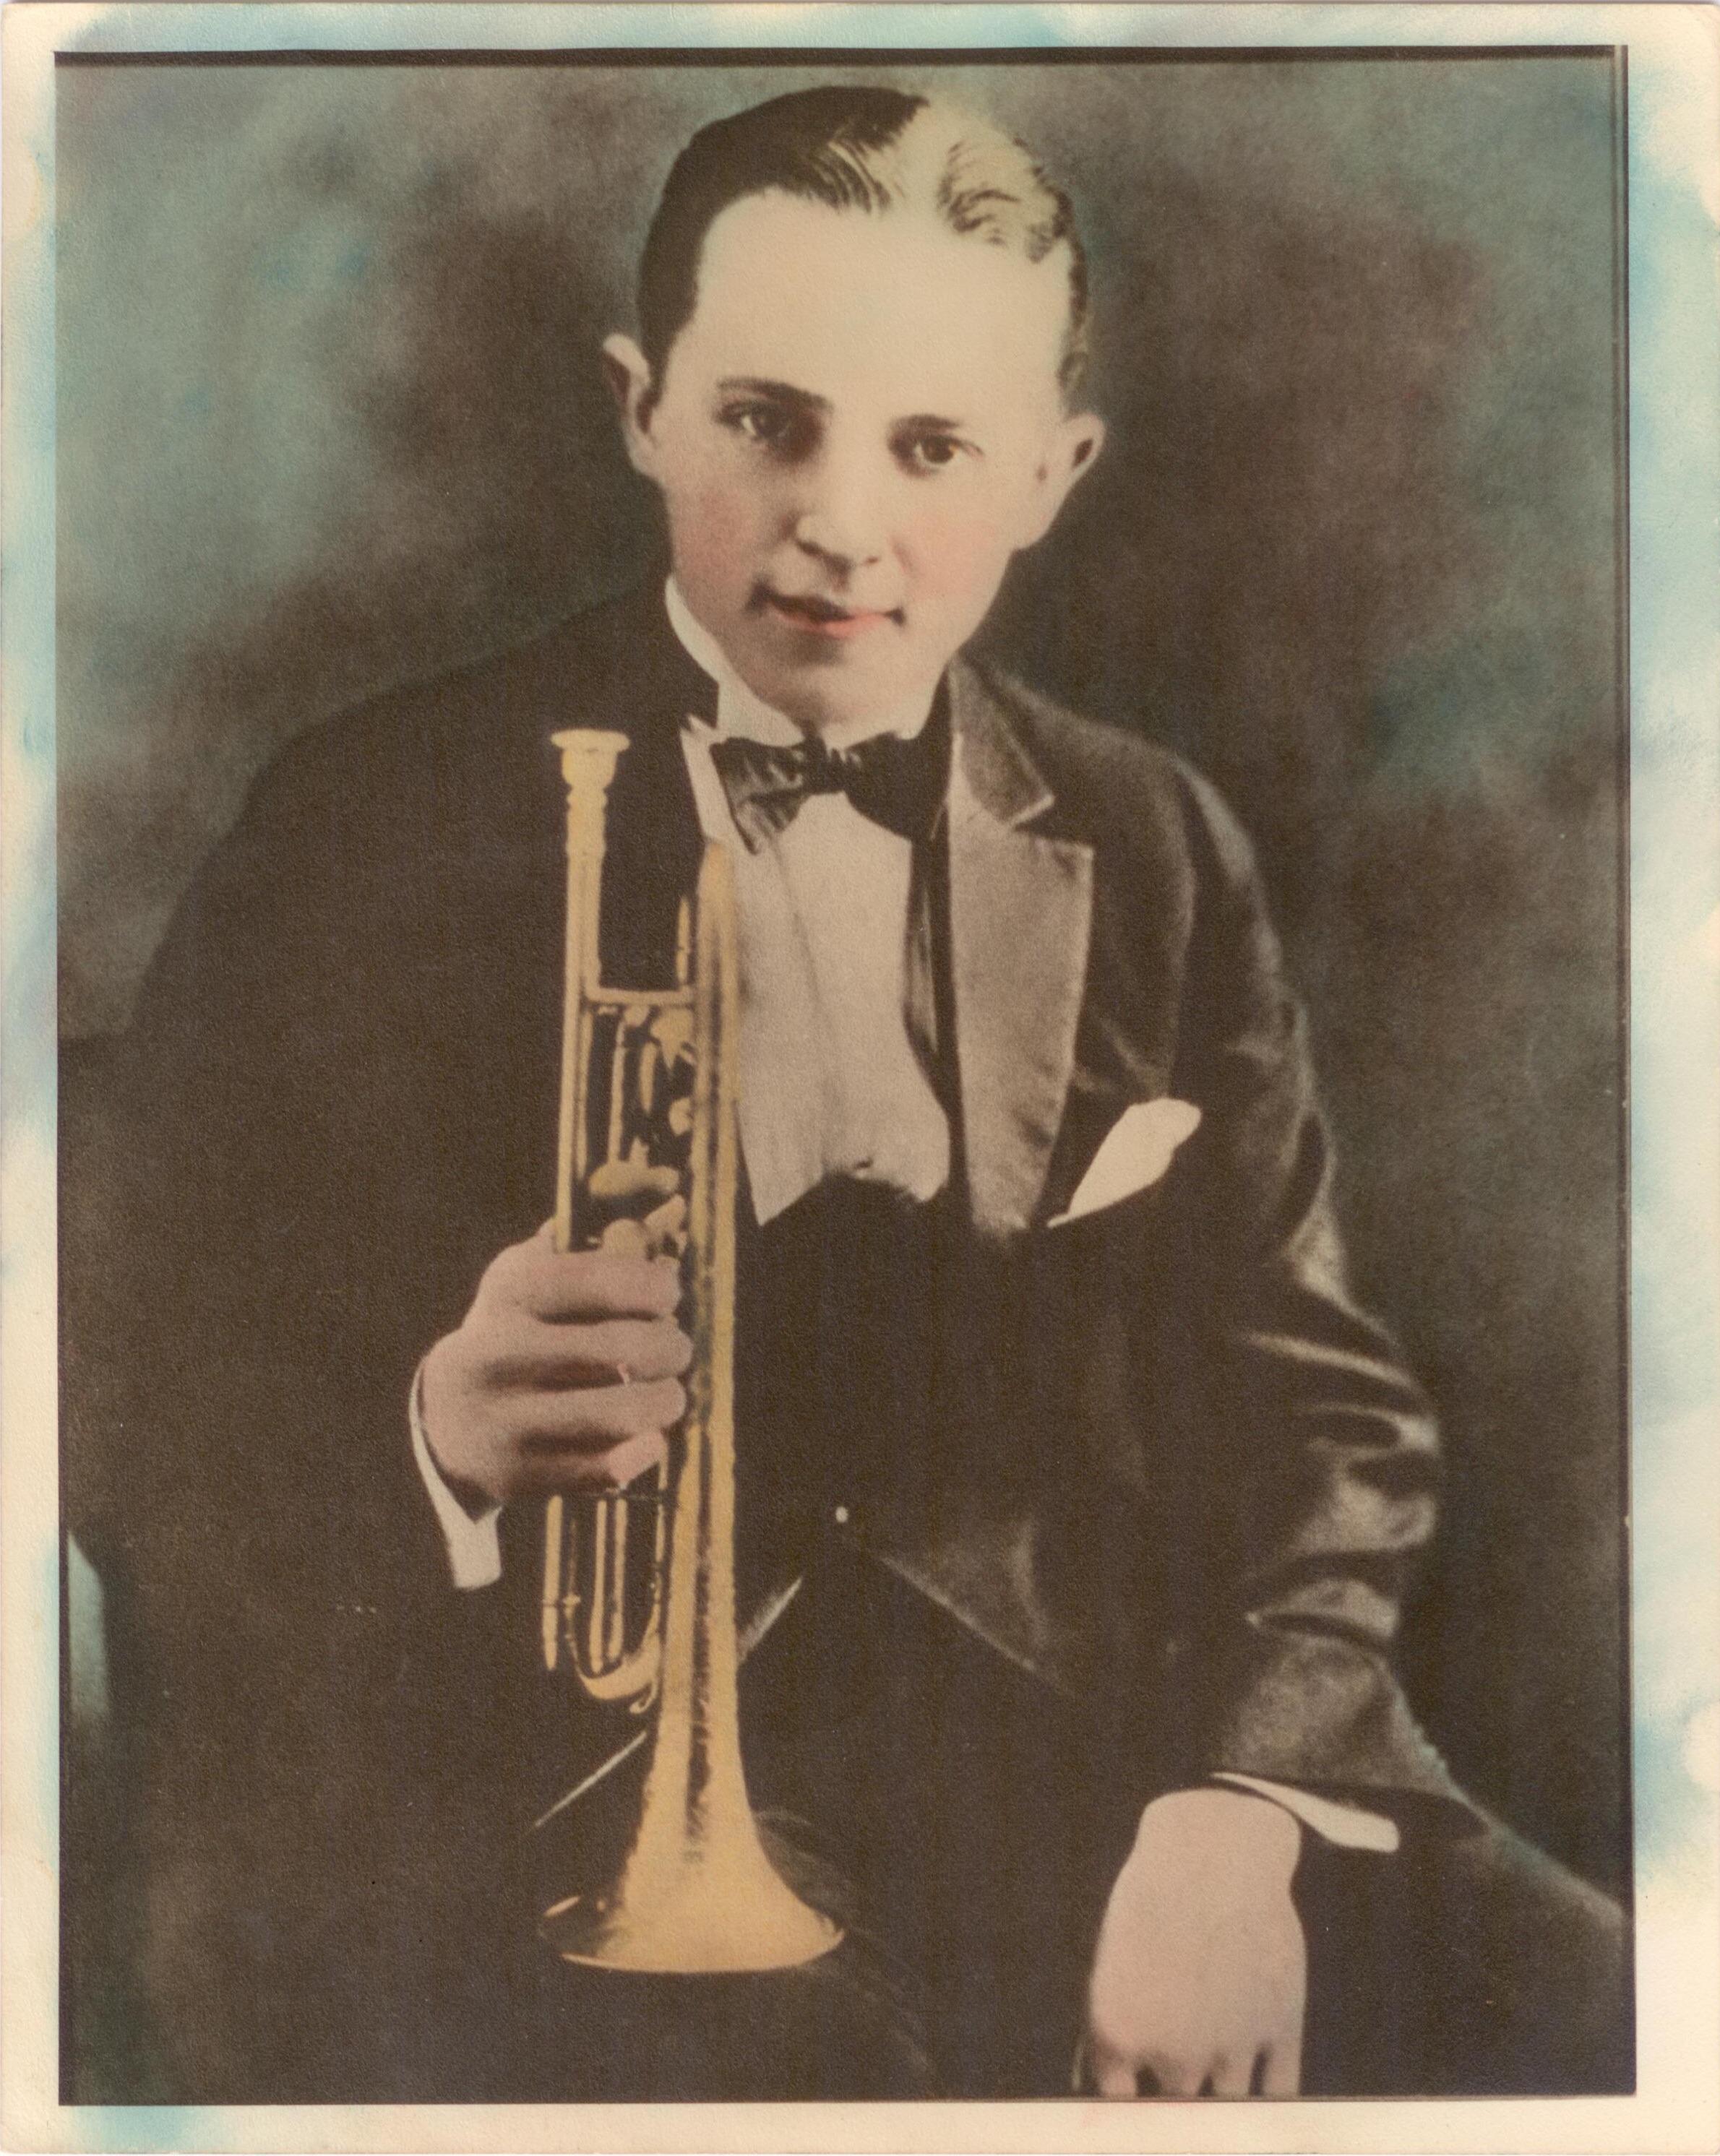 A colorized photo of Bix Beiderbecke, 1924. Courtesy of Indiana University.